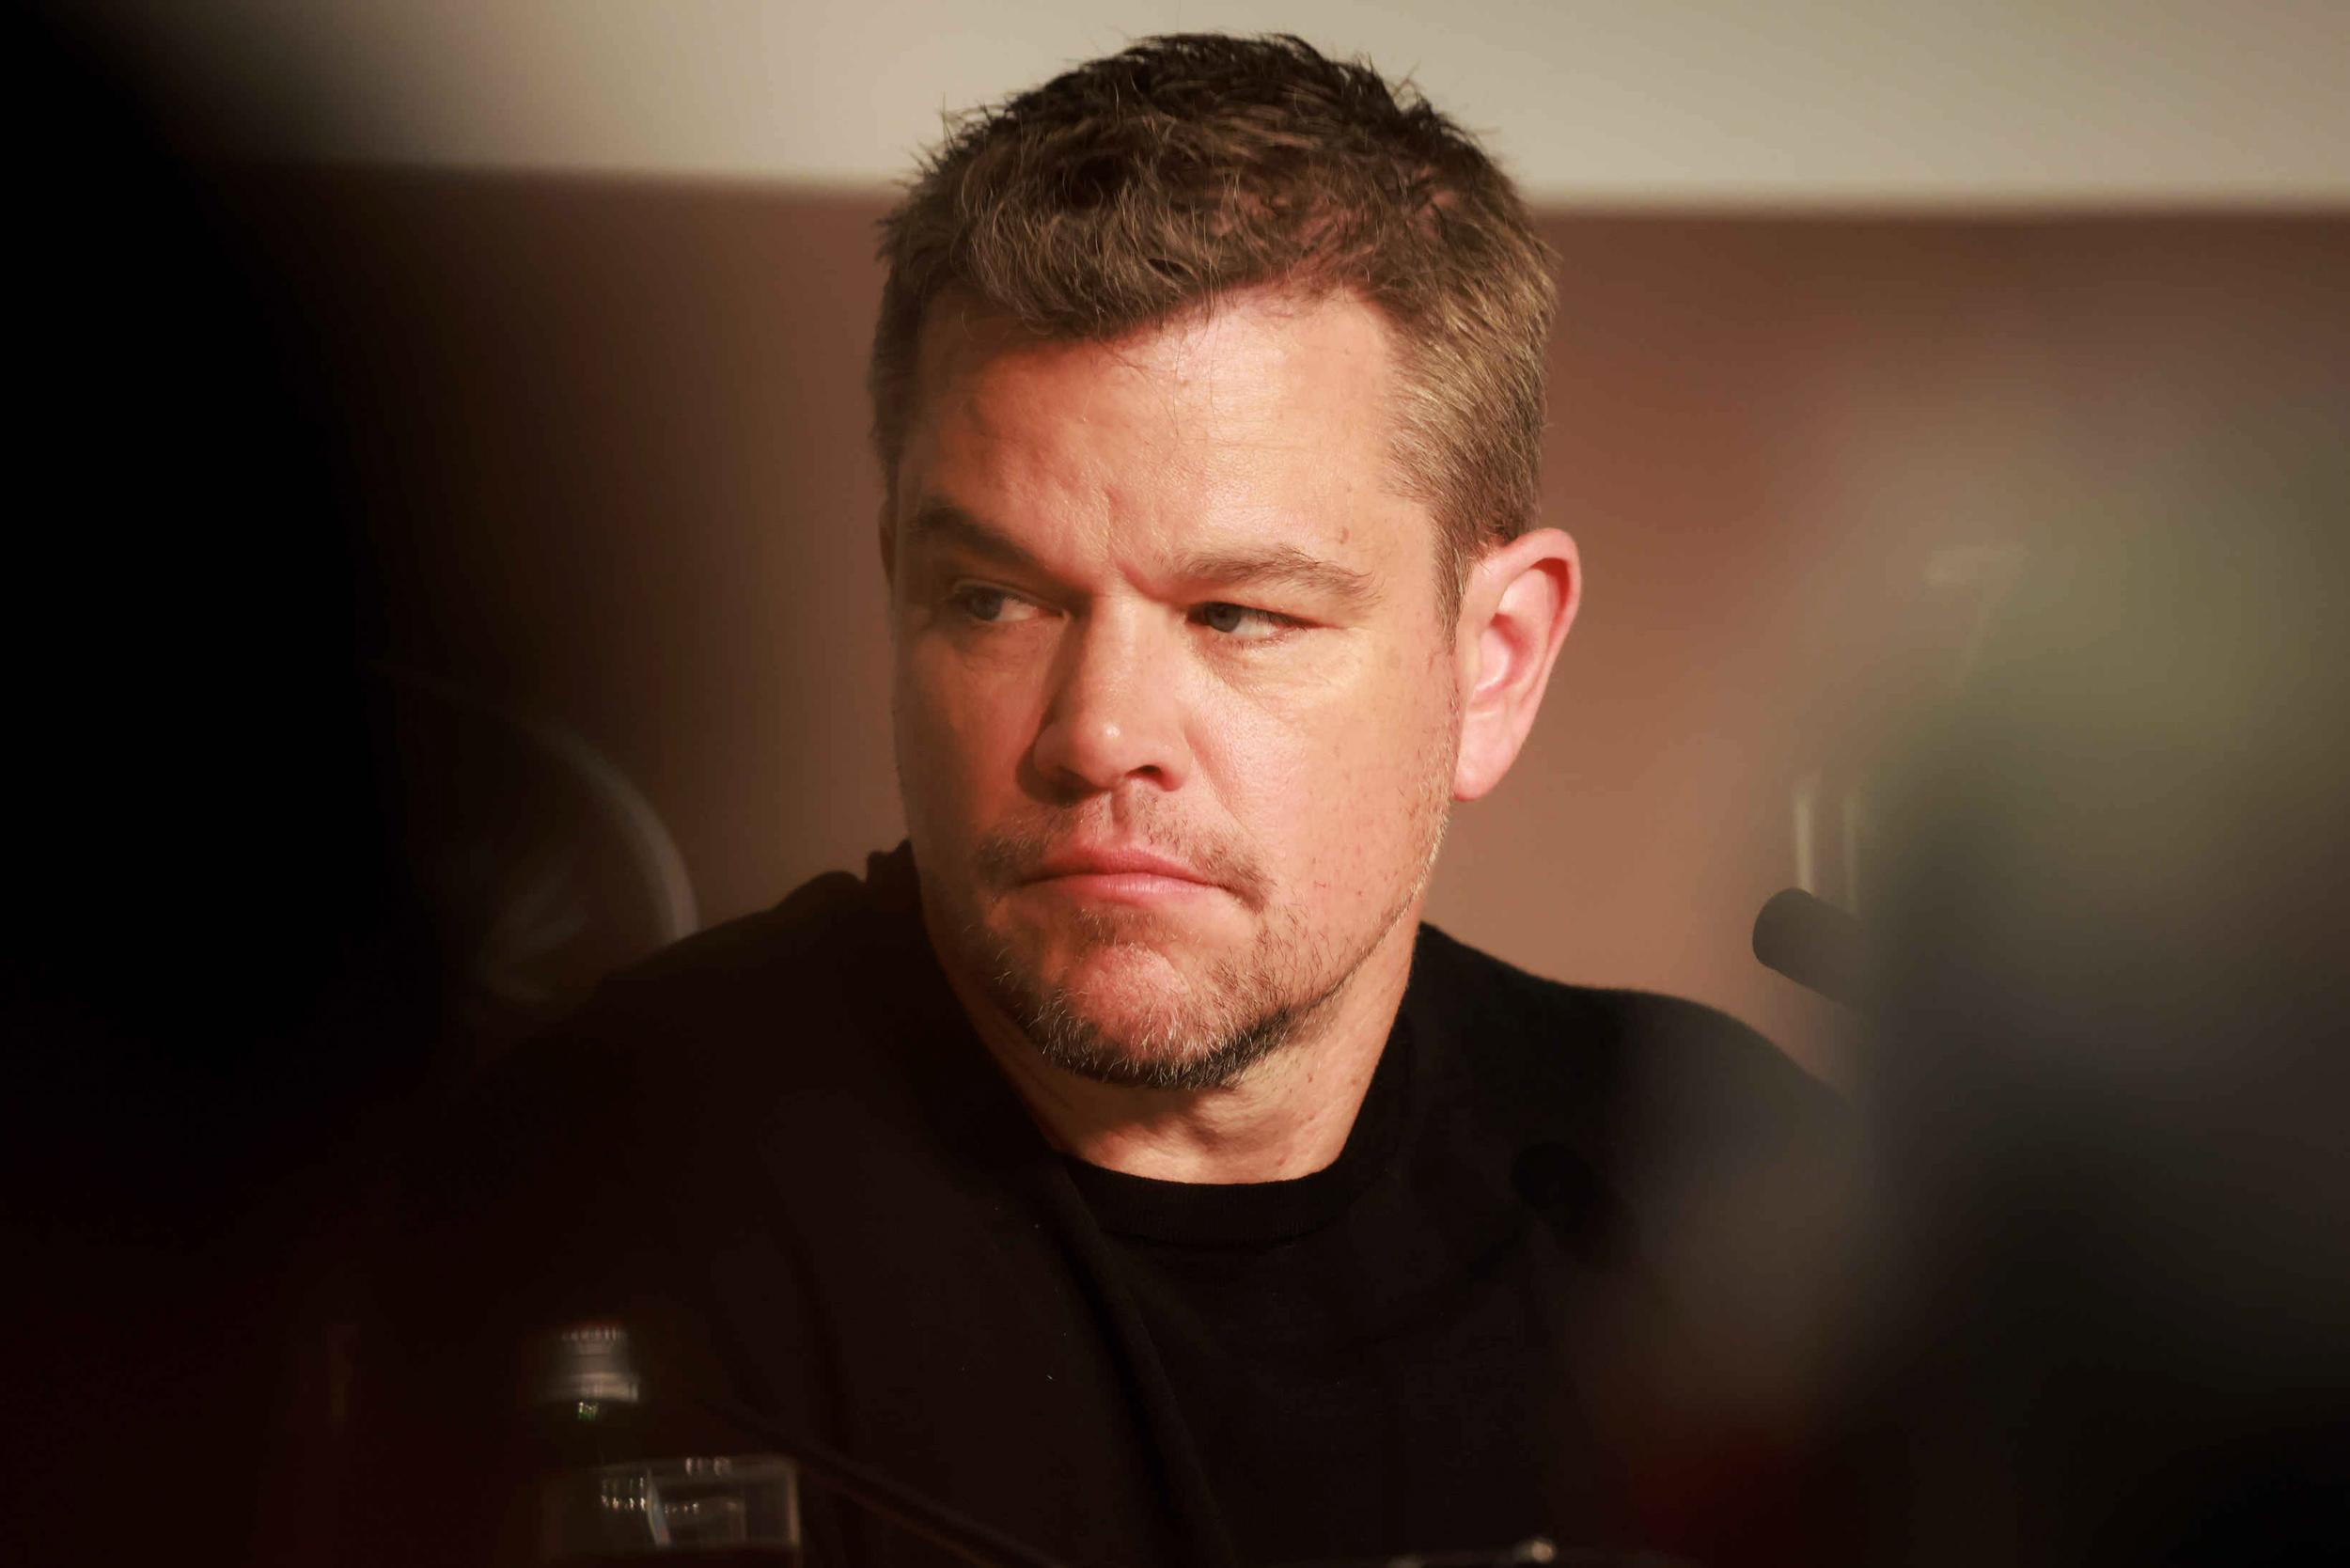 Matt Damon insists he never used 'f-slur': 'I stand with the LGBTQ+ community'